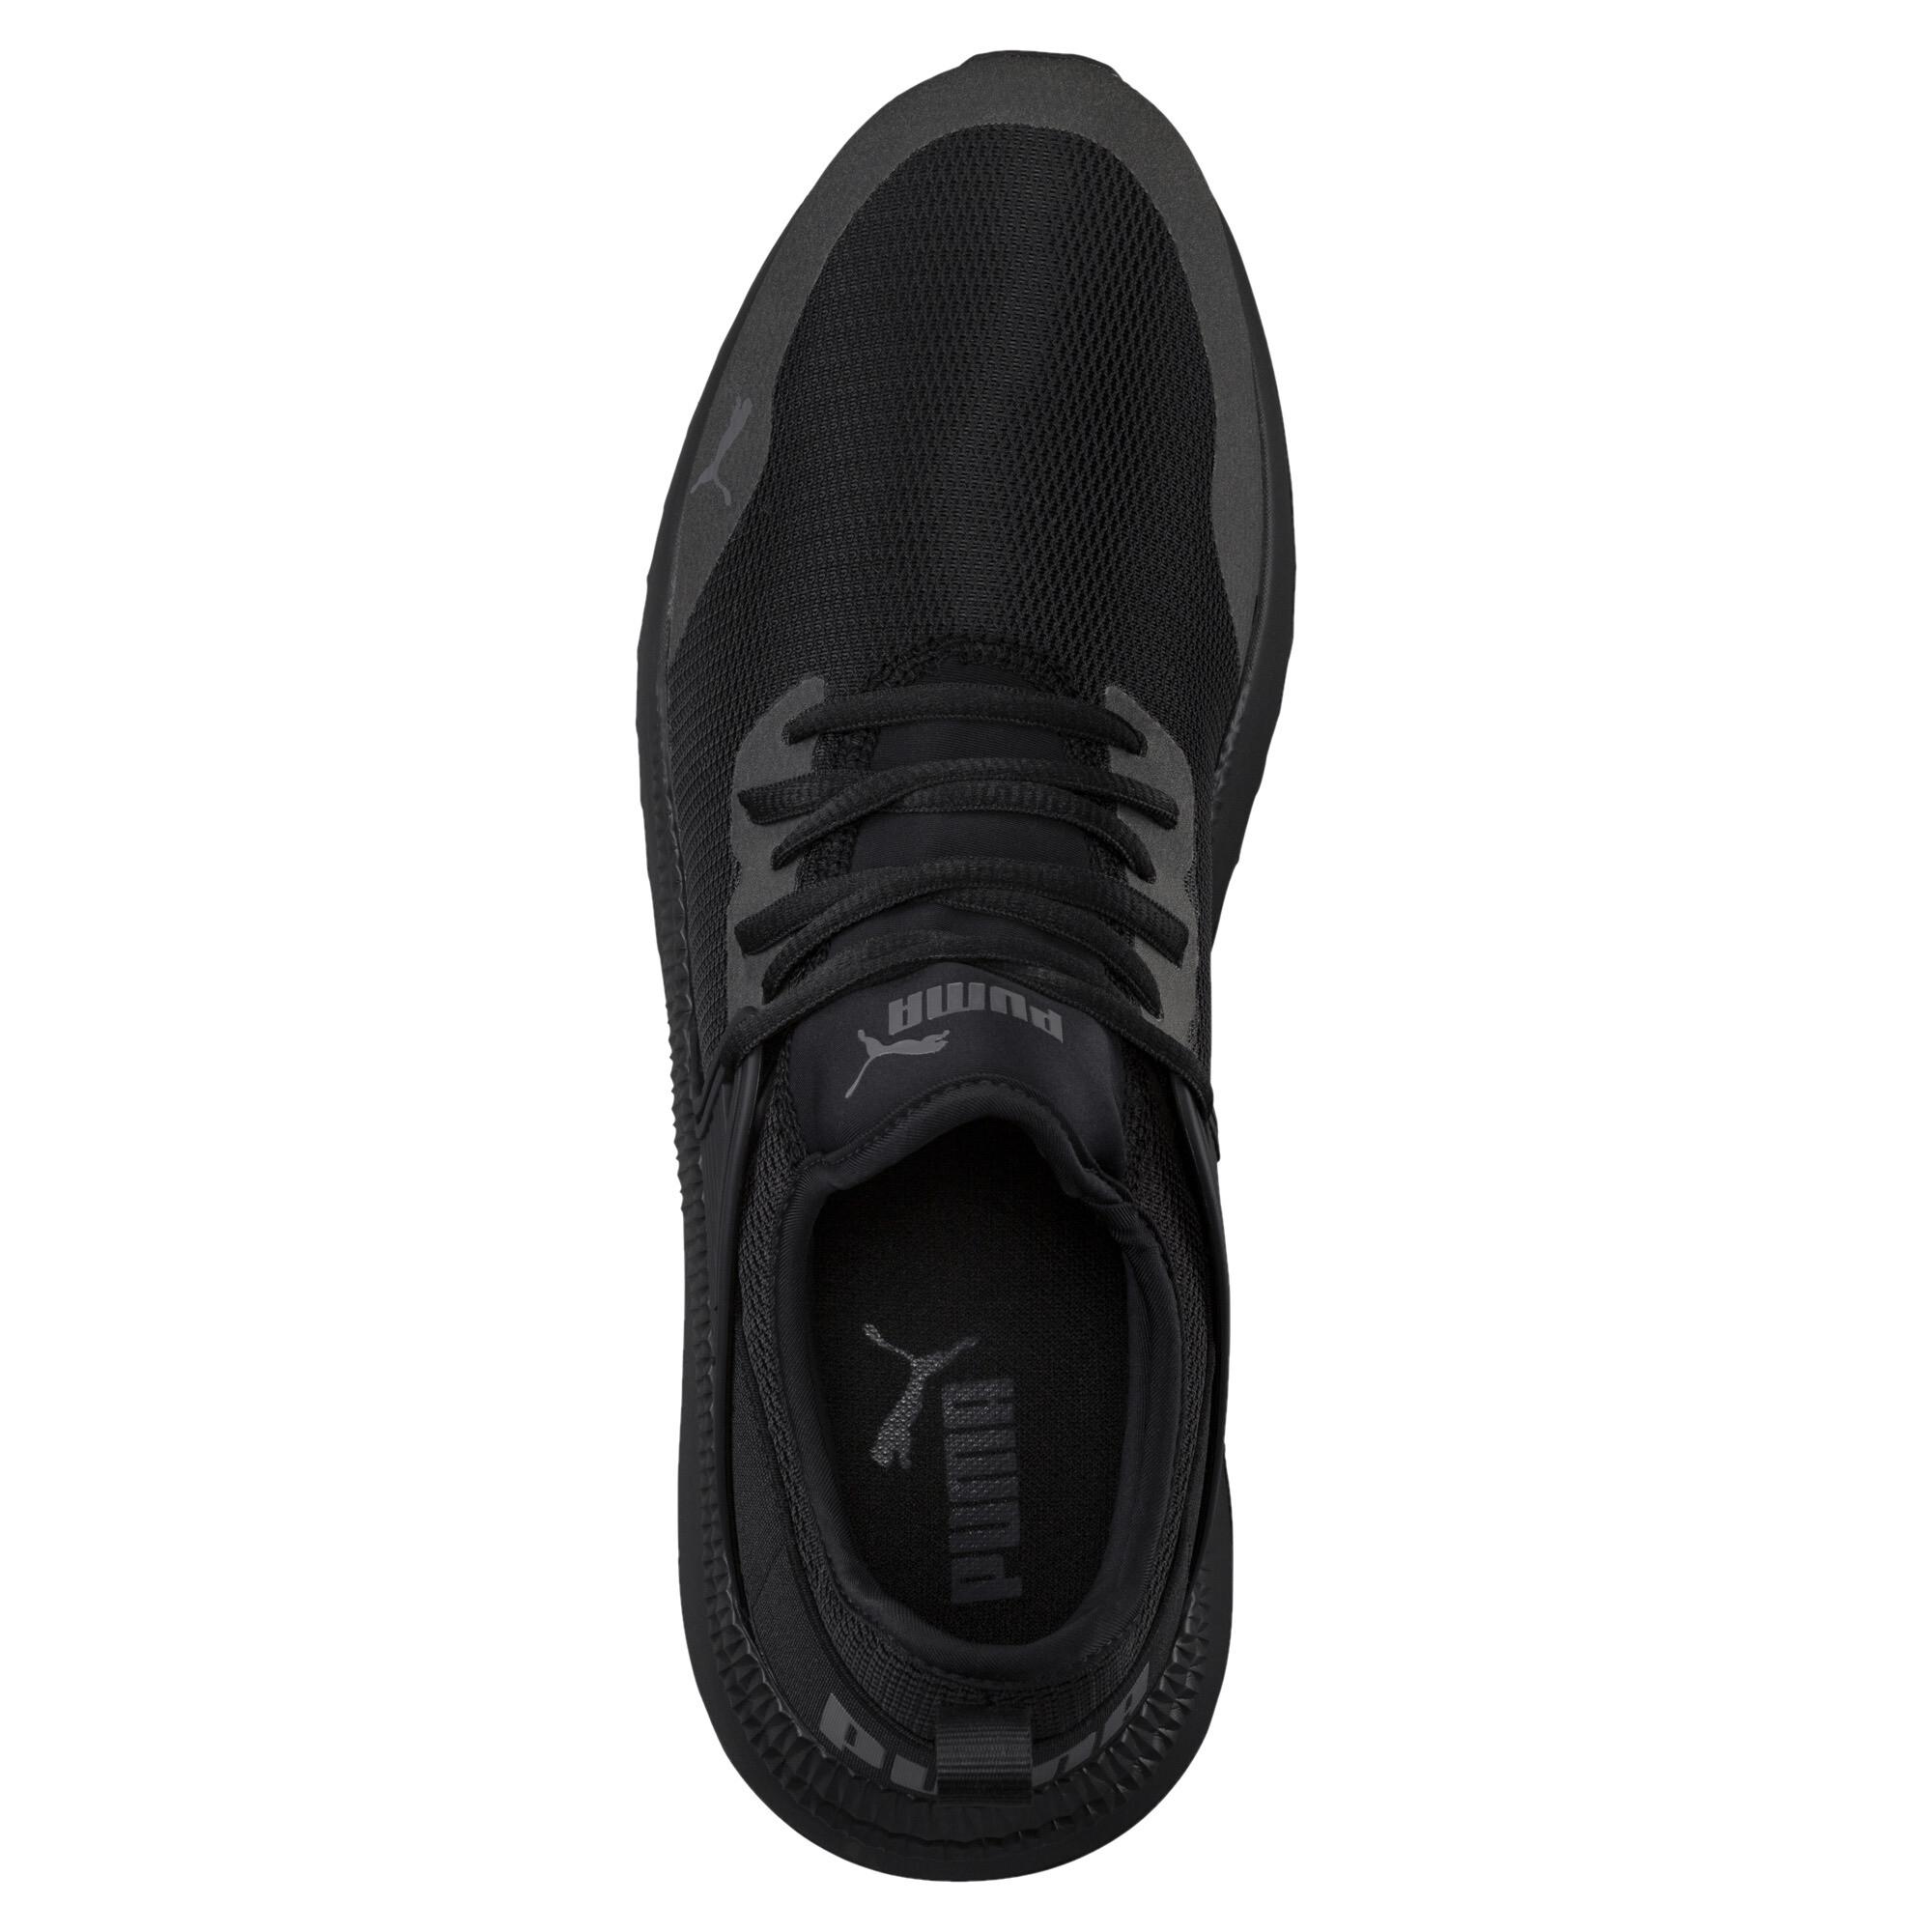 PUMA-Pacer-Next-Cage-Sneakers-Men-Shoe-Basics thumbnail 6